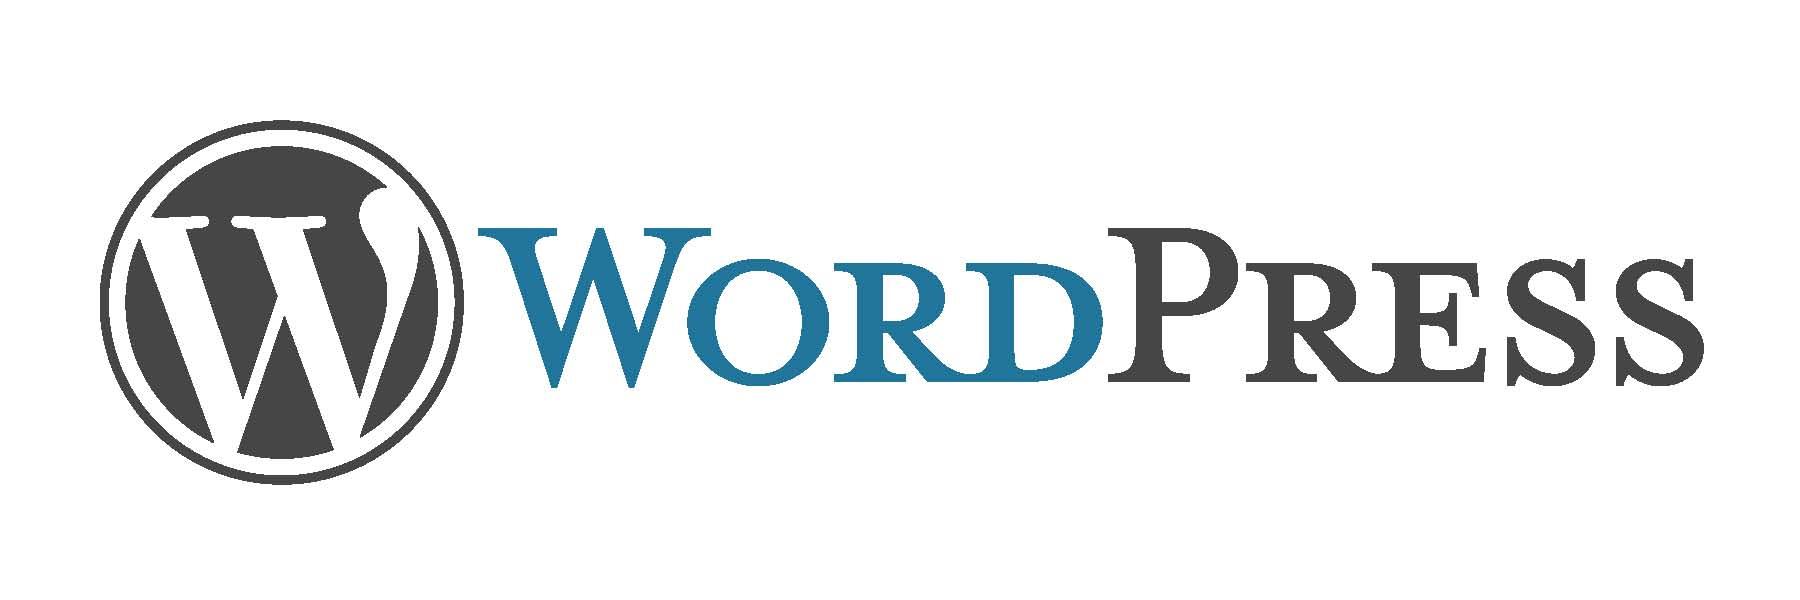 wordpress sardegna plugin